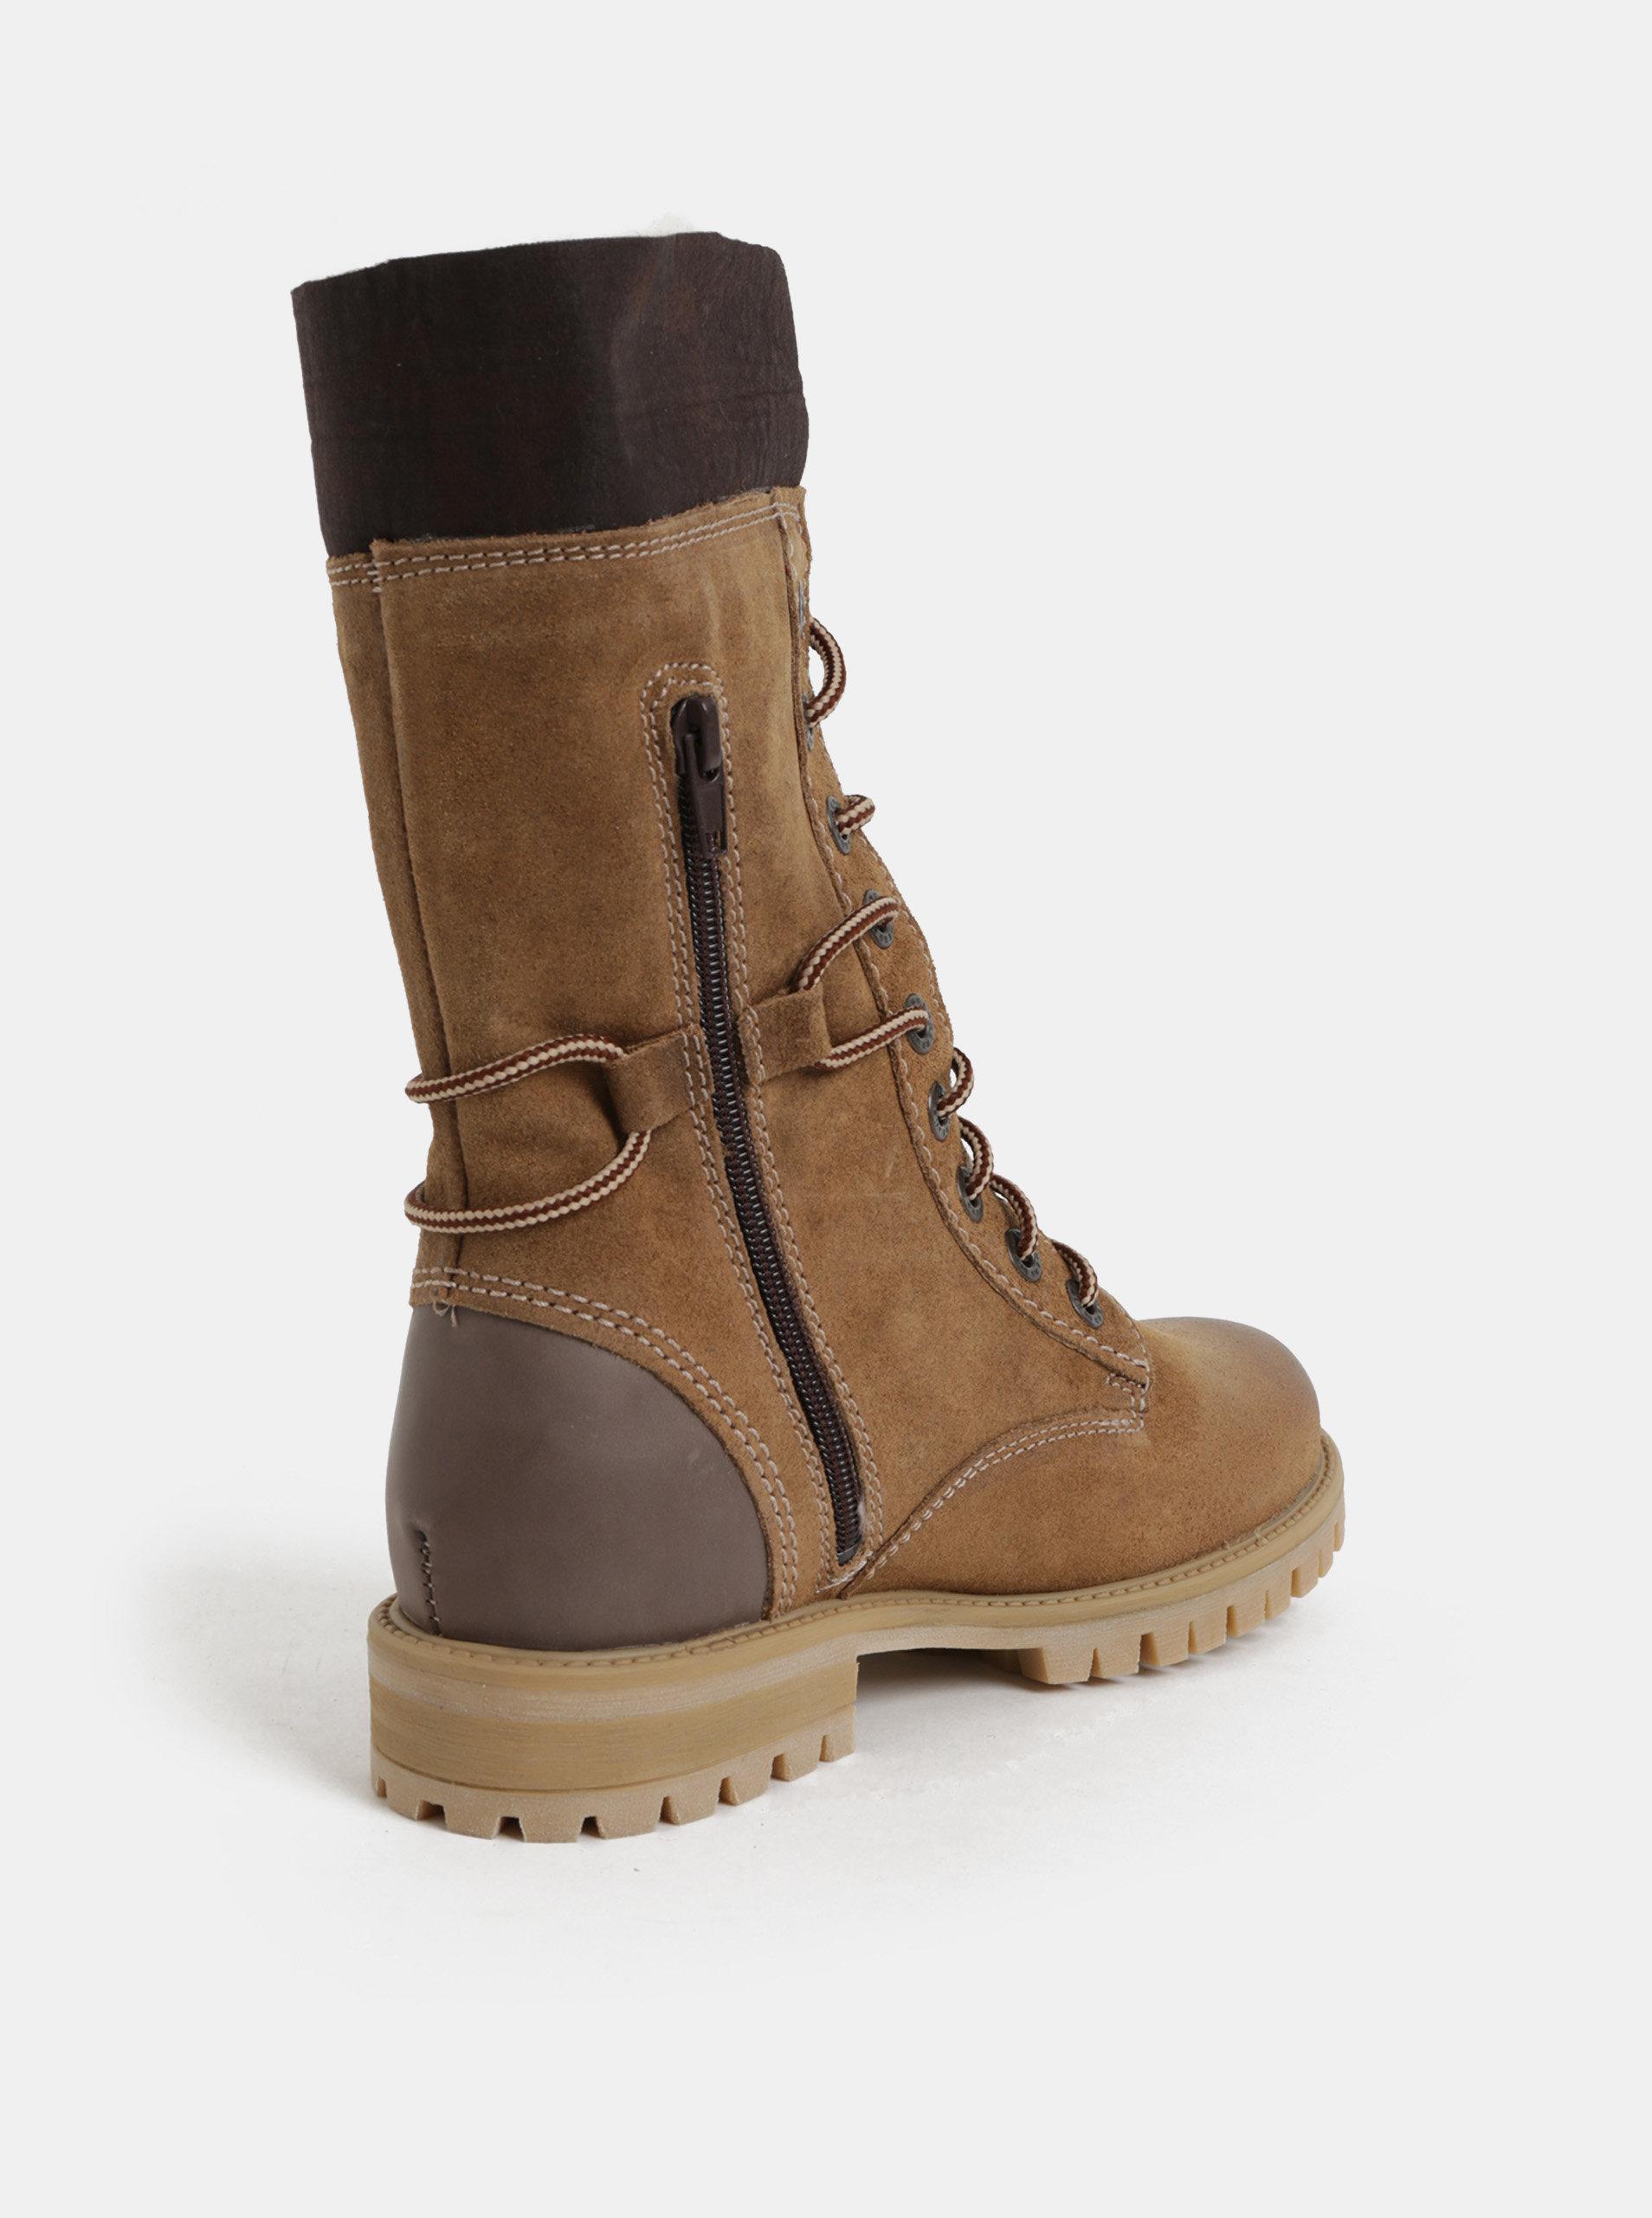 c2f2920a49de Hnedé dámske semišové členkové zimné topánky so šnurovaním Weinbrenner ...